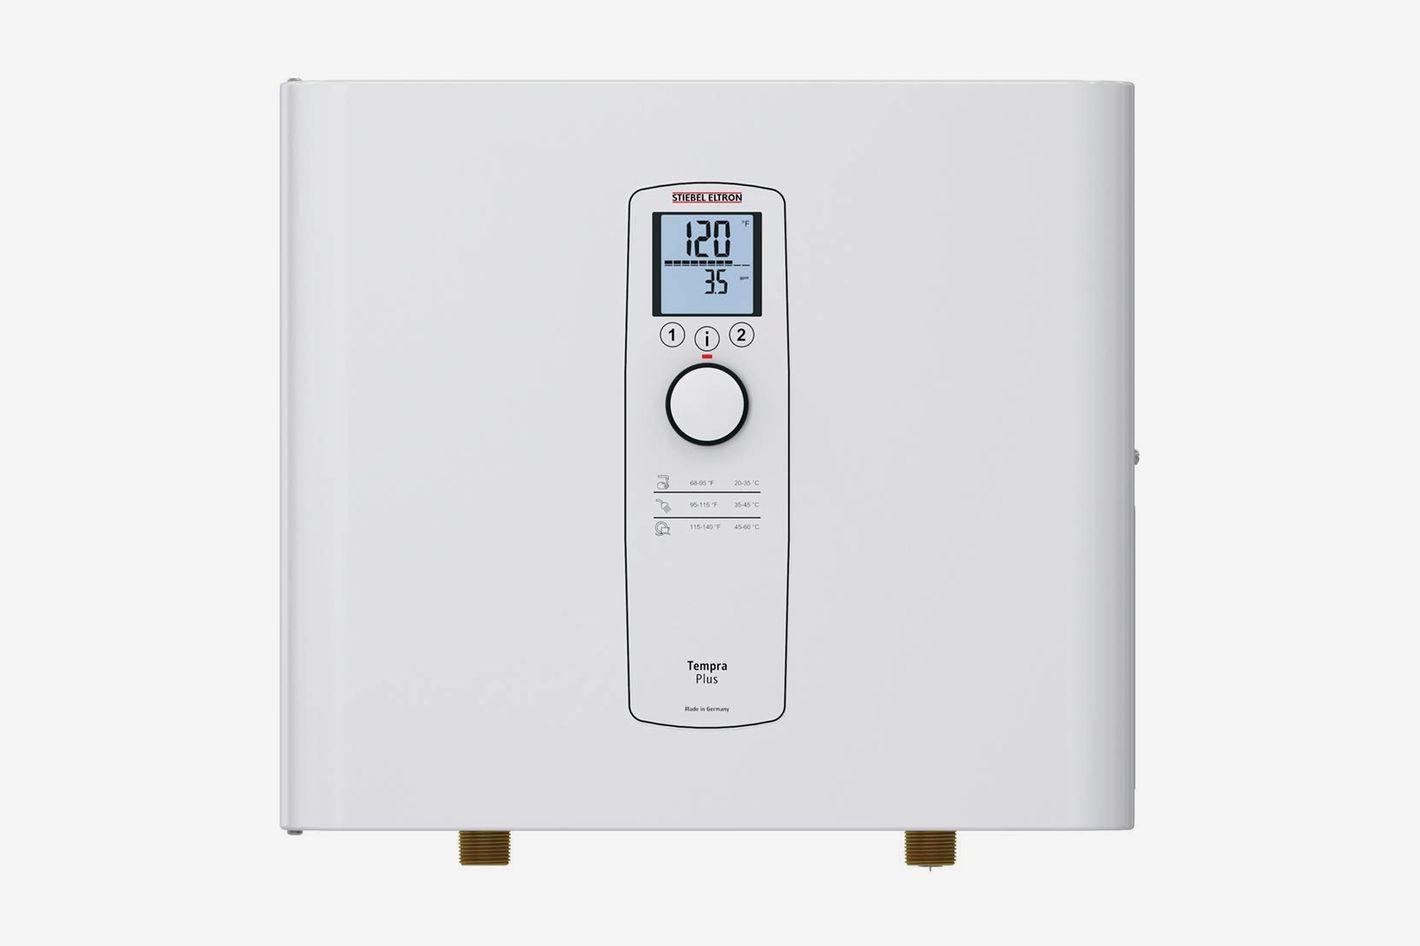 Stiebel Eltron 29 Plus Tempra, Tankless Water Heater, White